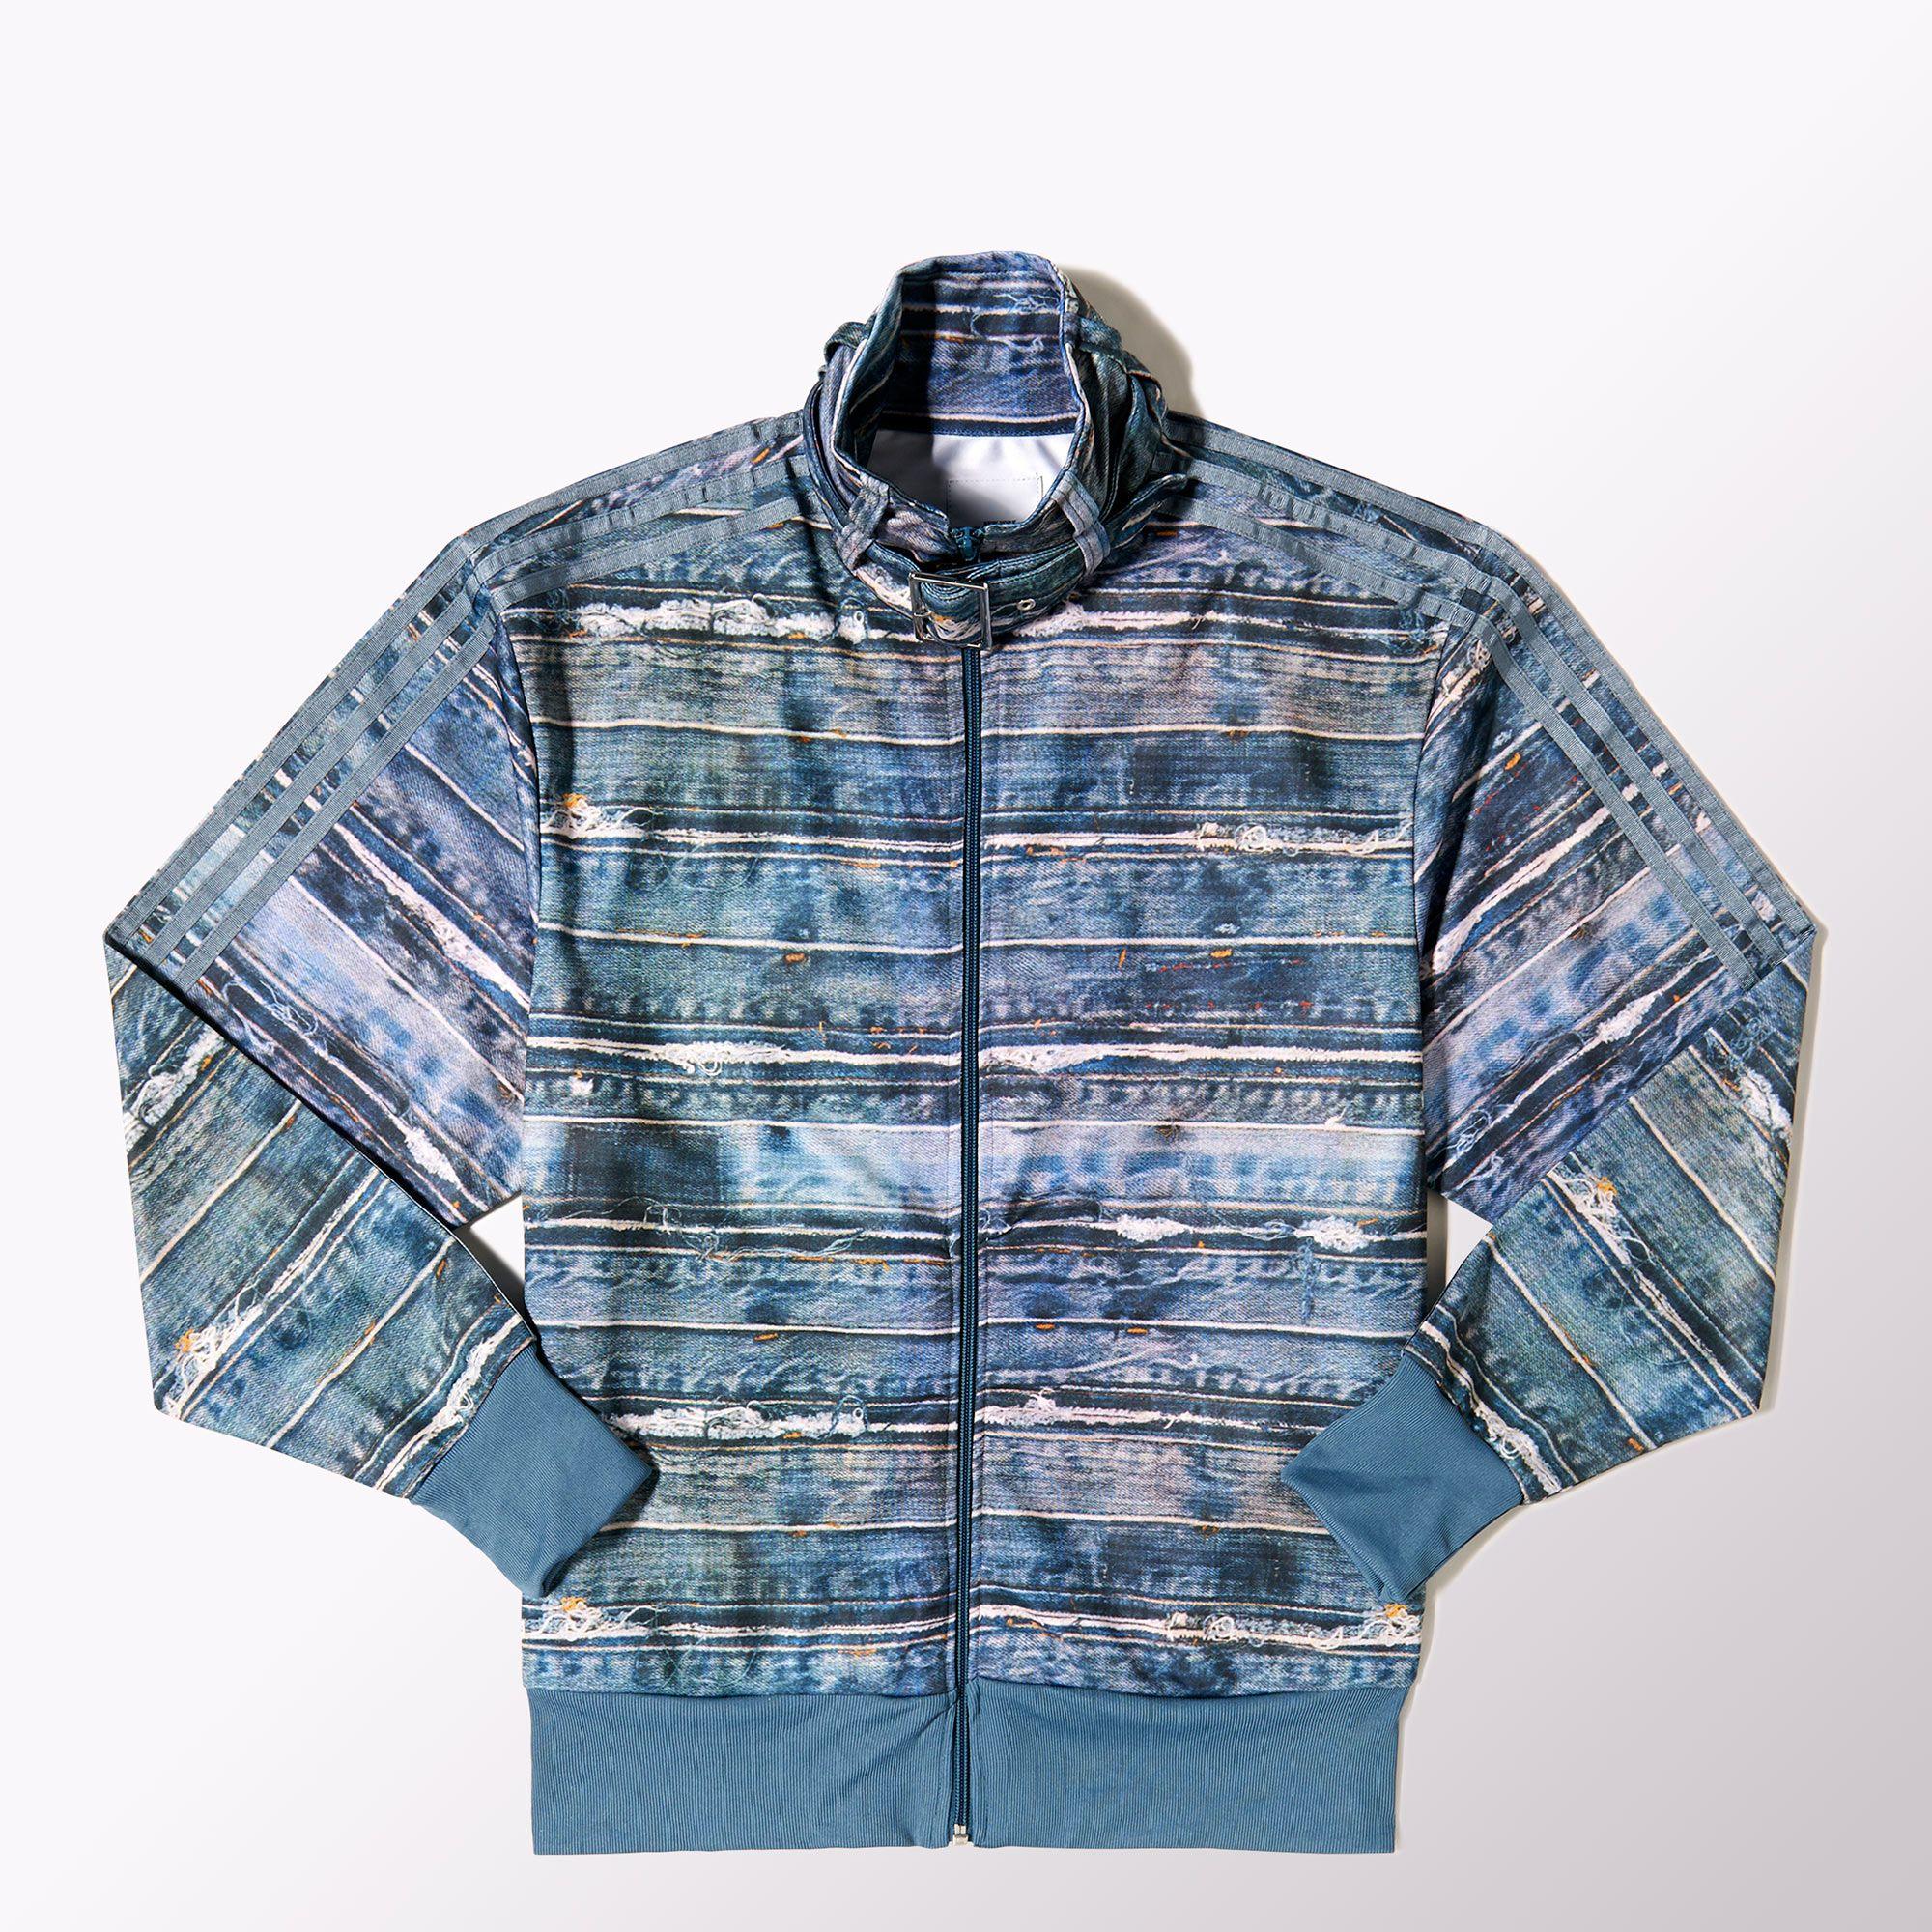 Adidas Denim Print Track Jacket Adidas Uk Jackets Track Jackets Adidas Online [ 2000 x 2000 Pixel ]